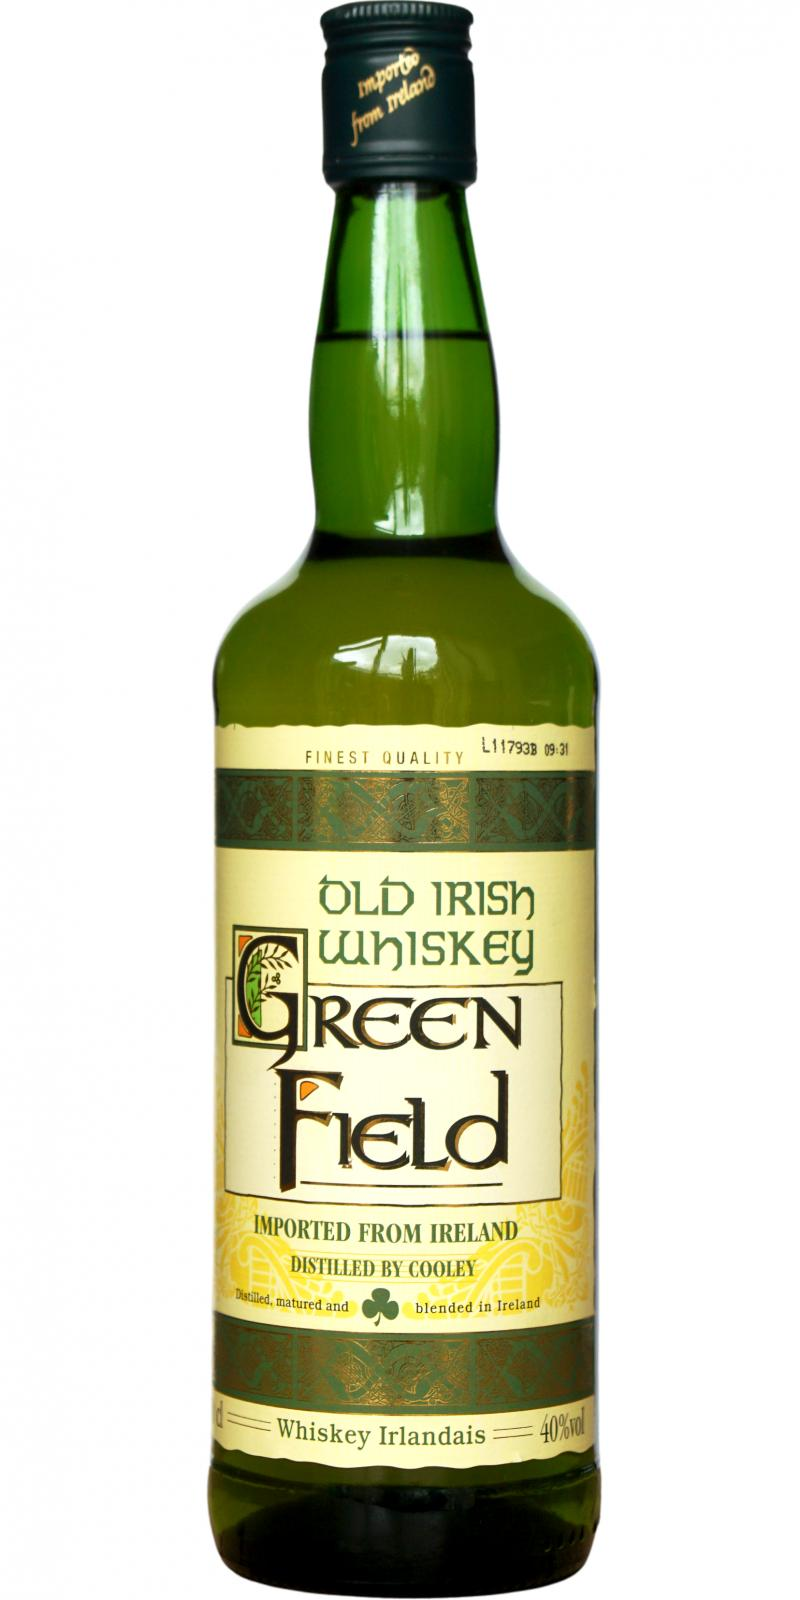 Green Field Old Irish Whiskey